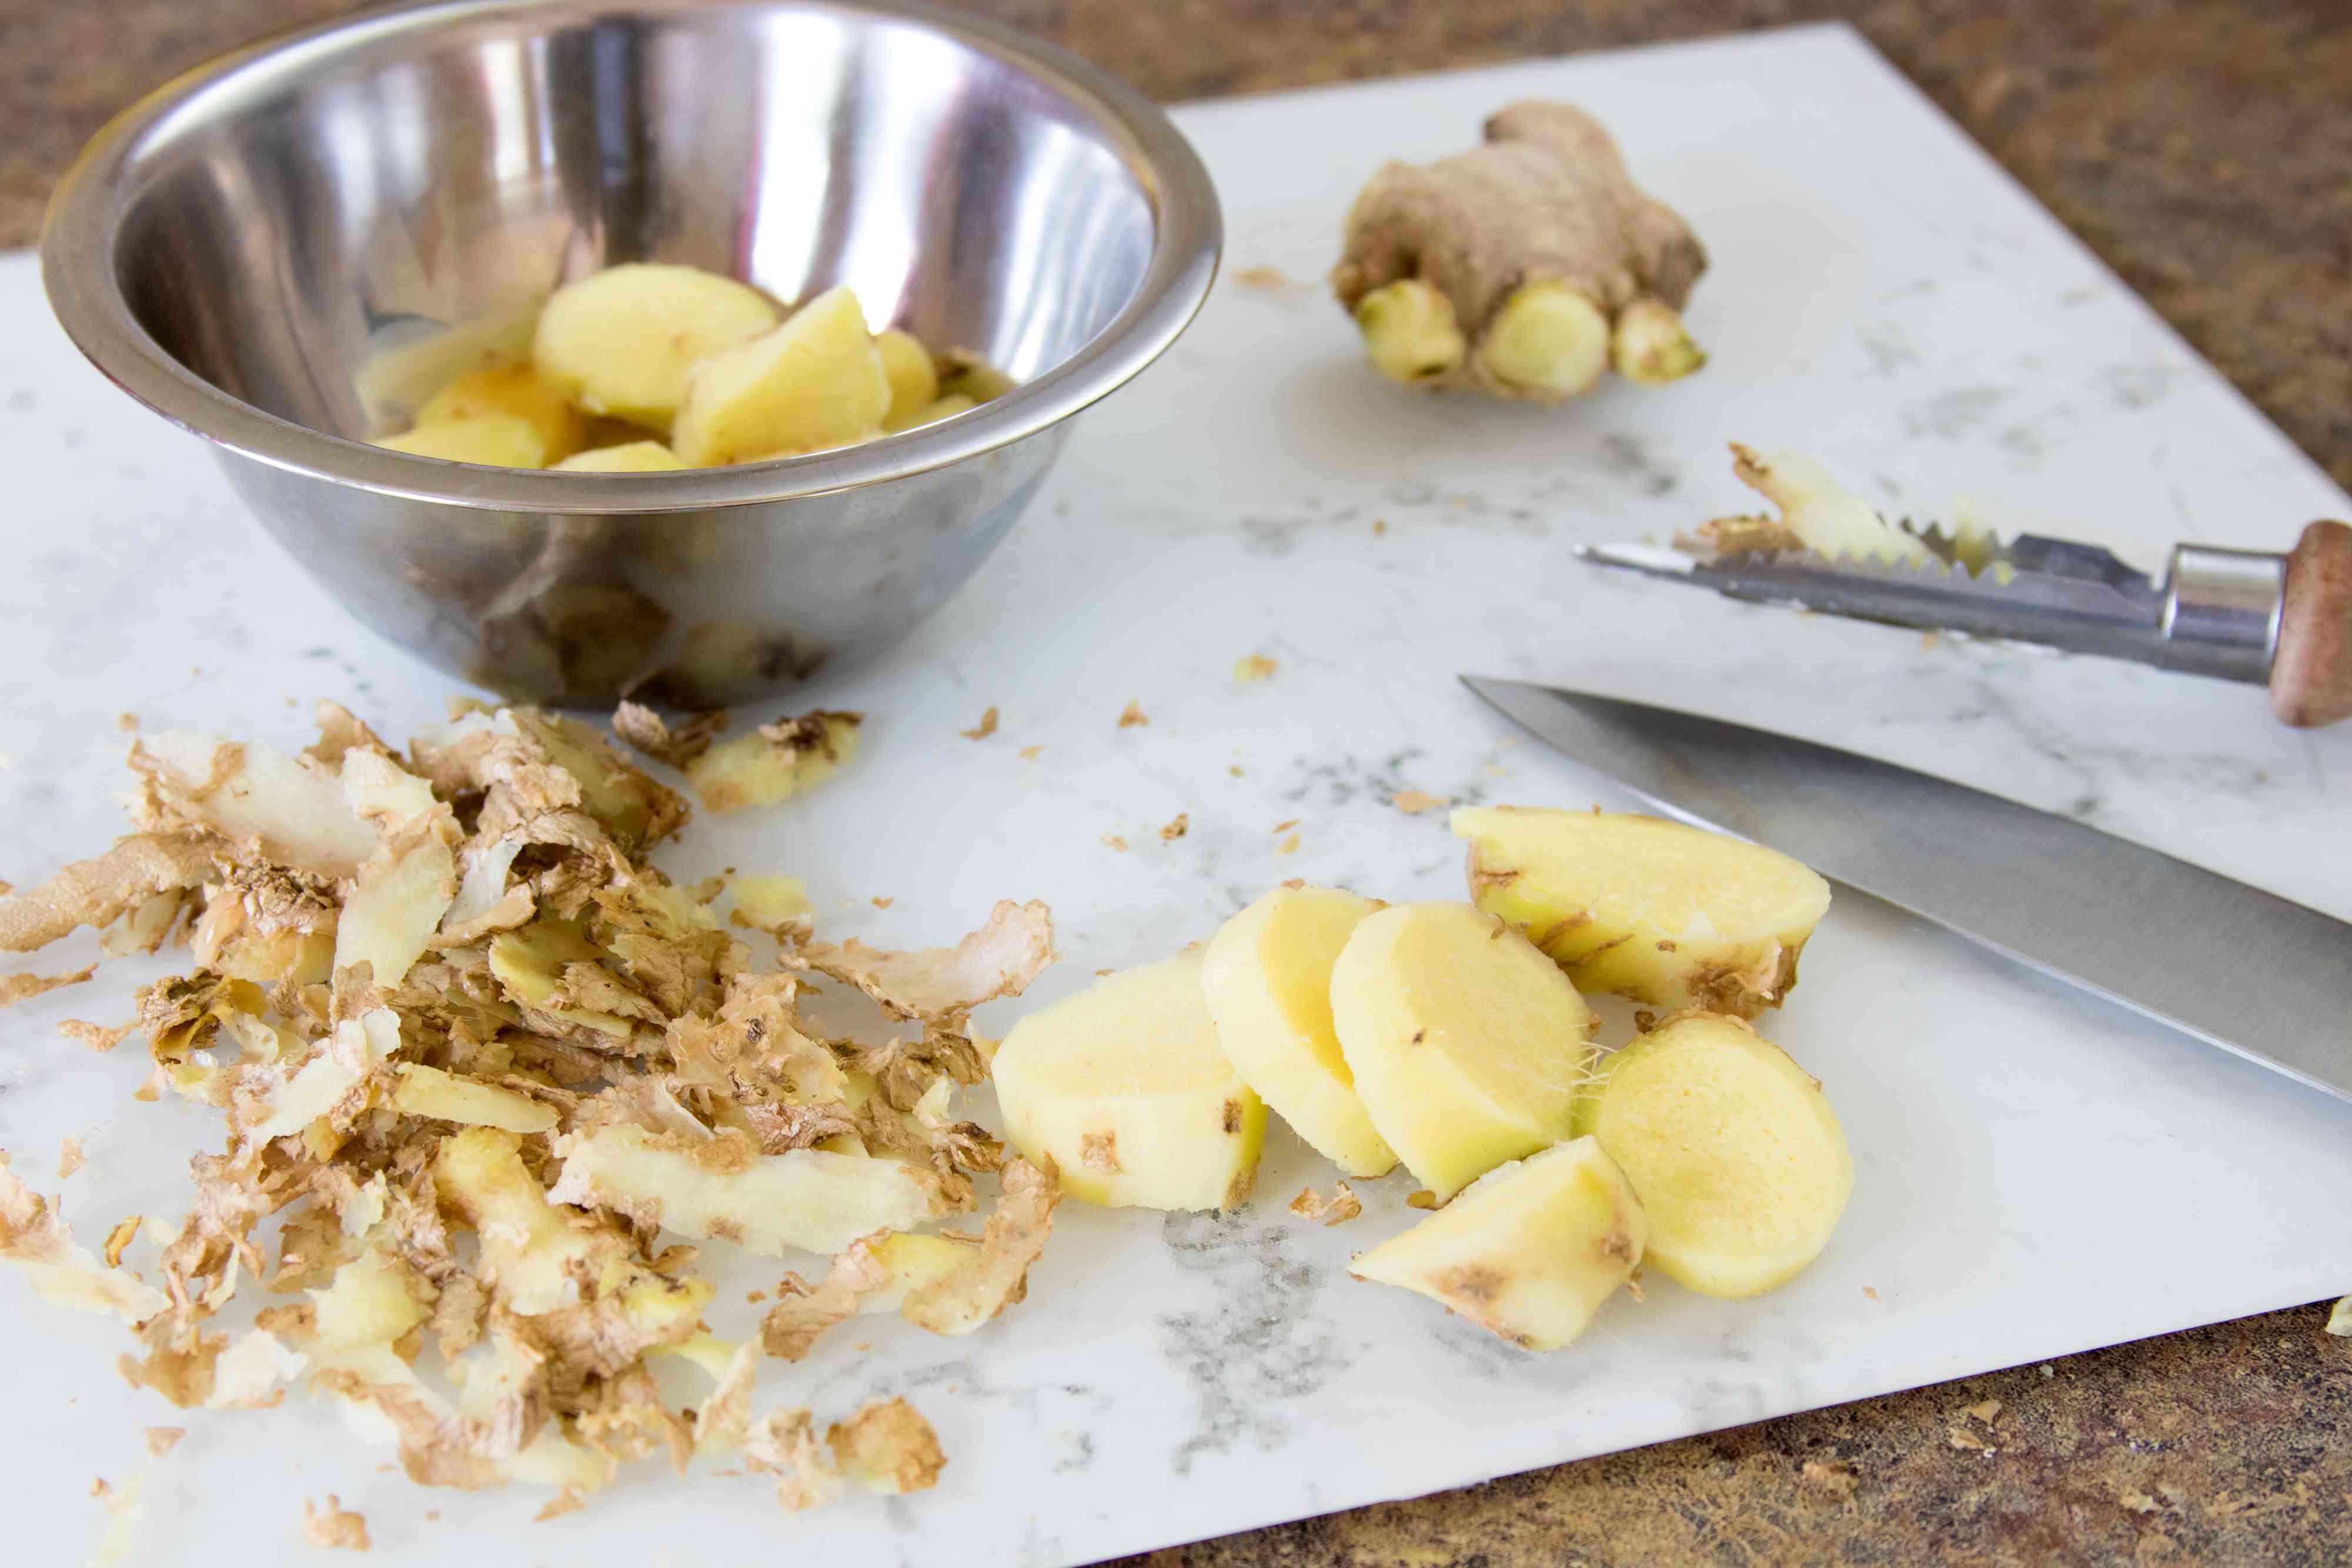 Preparing Fresh Ginger Root for Ginger Syrup